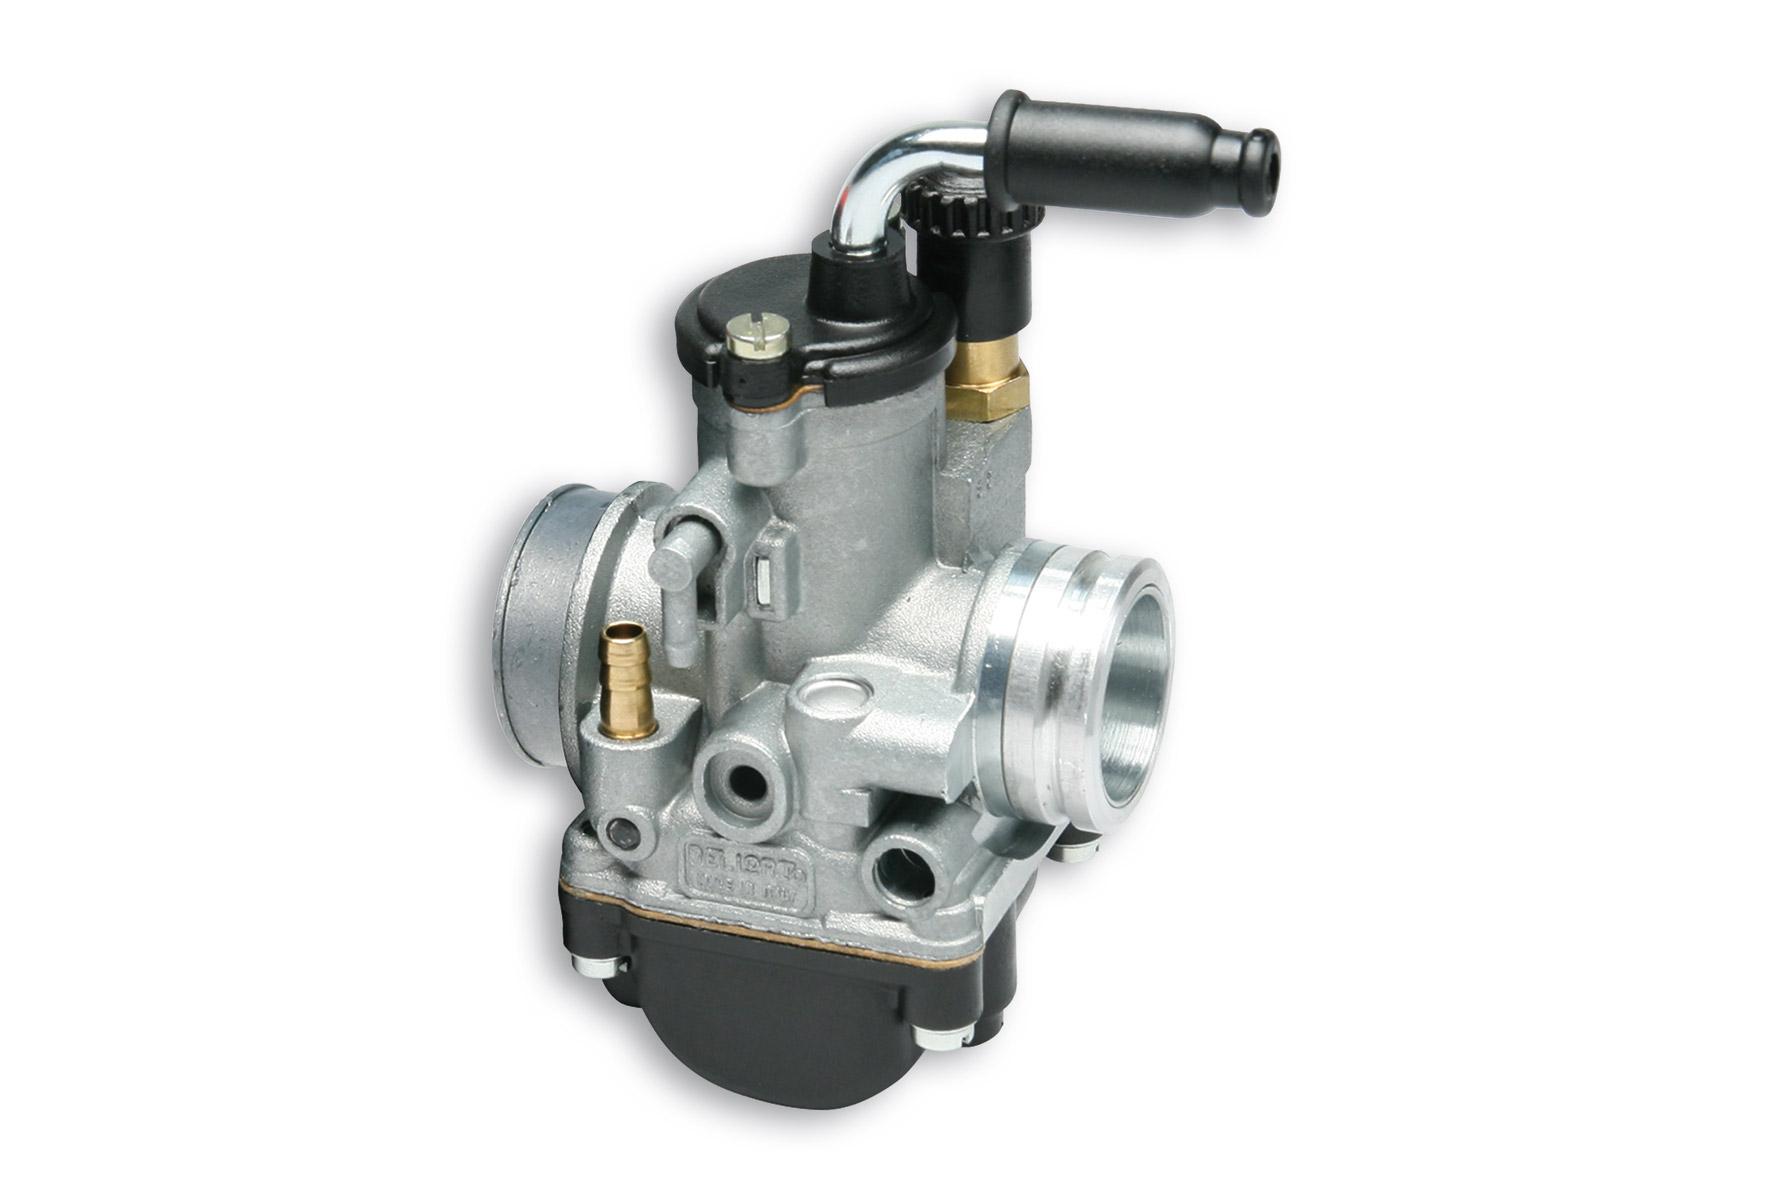 Carburatore PHBG 21 BS MHR